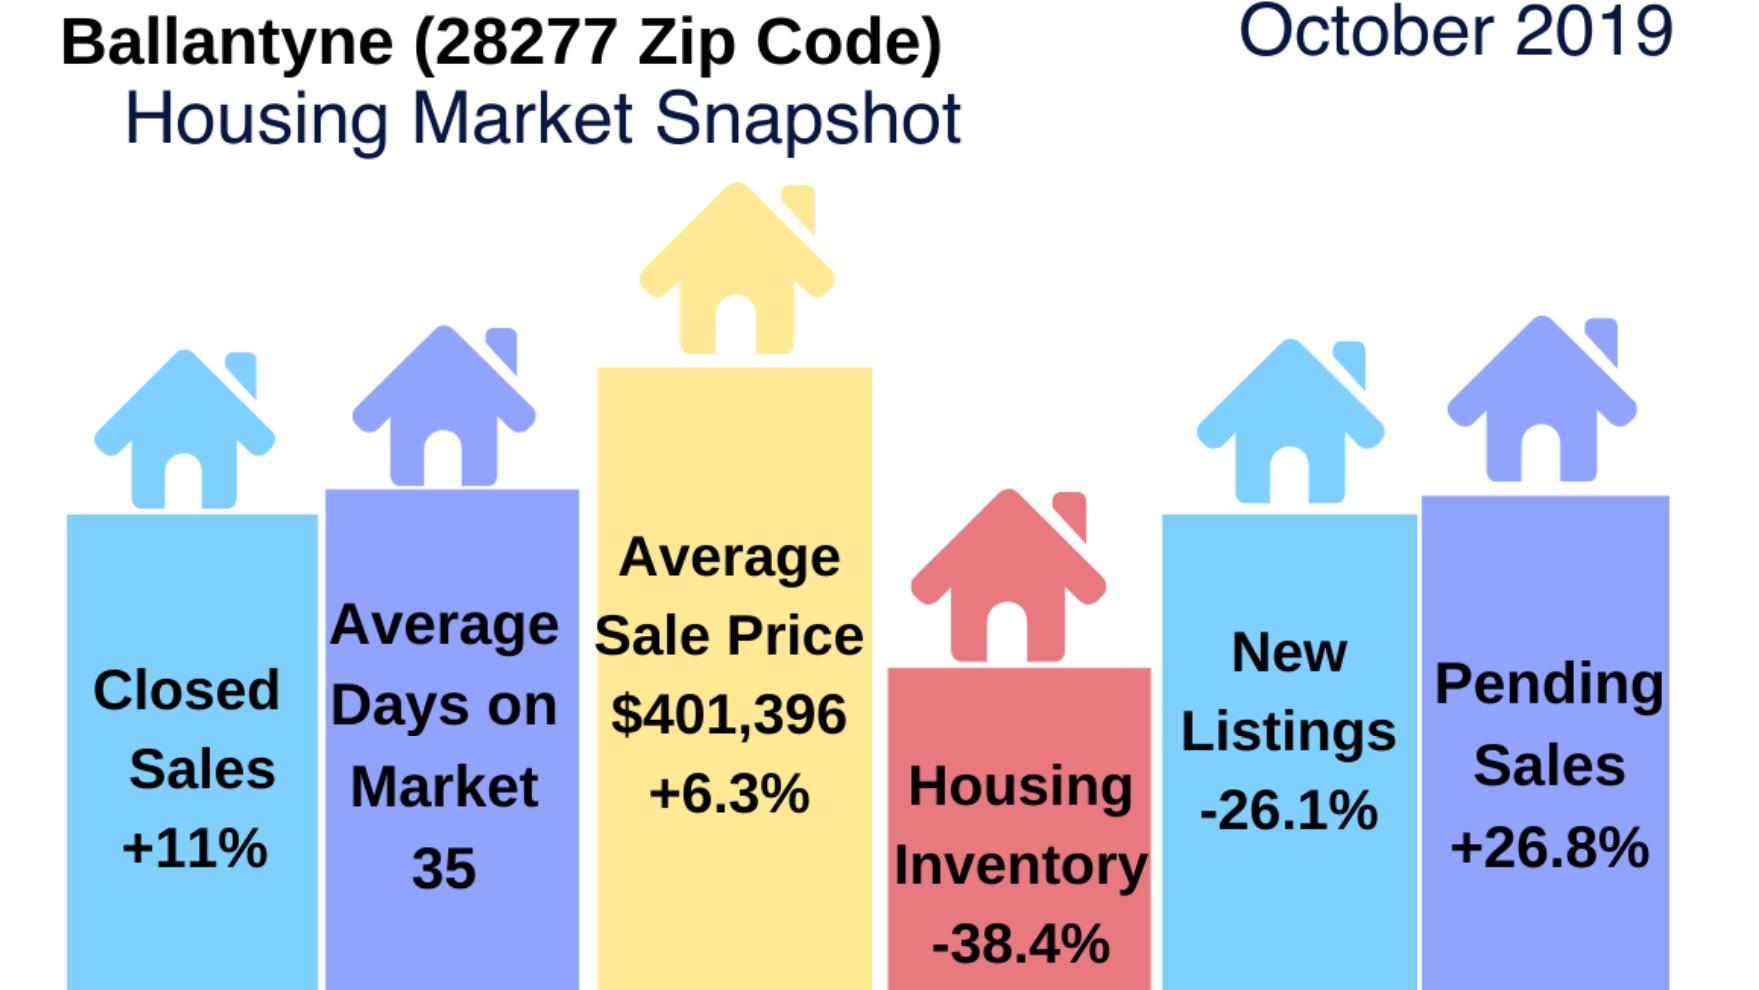 Ballantyne Real Estate Report: October 2019